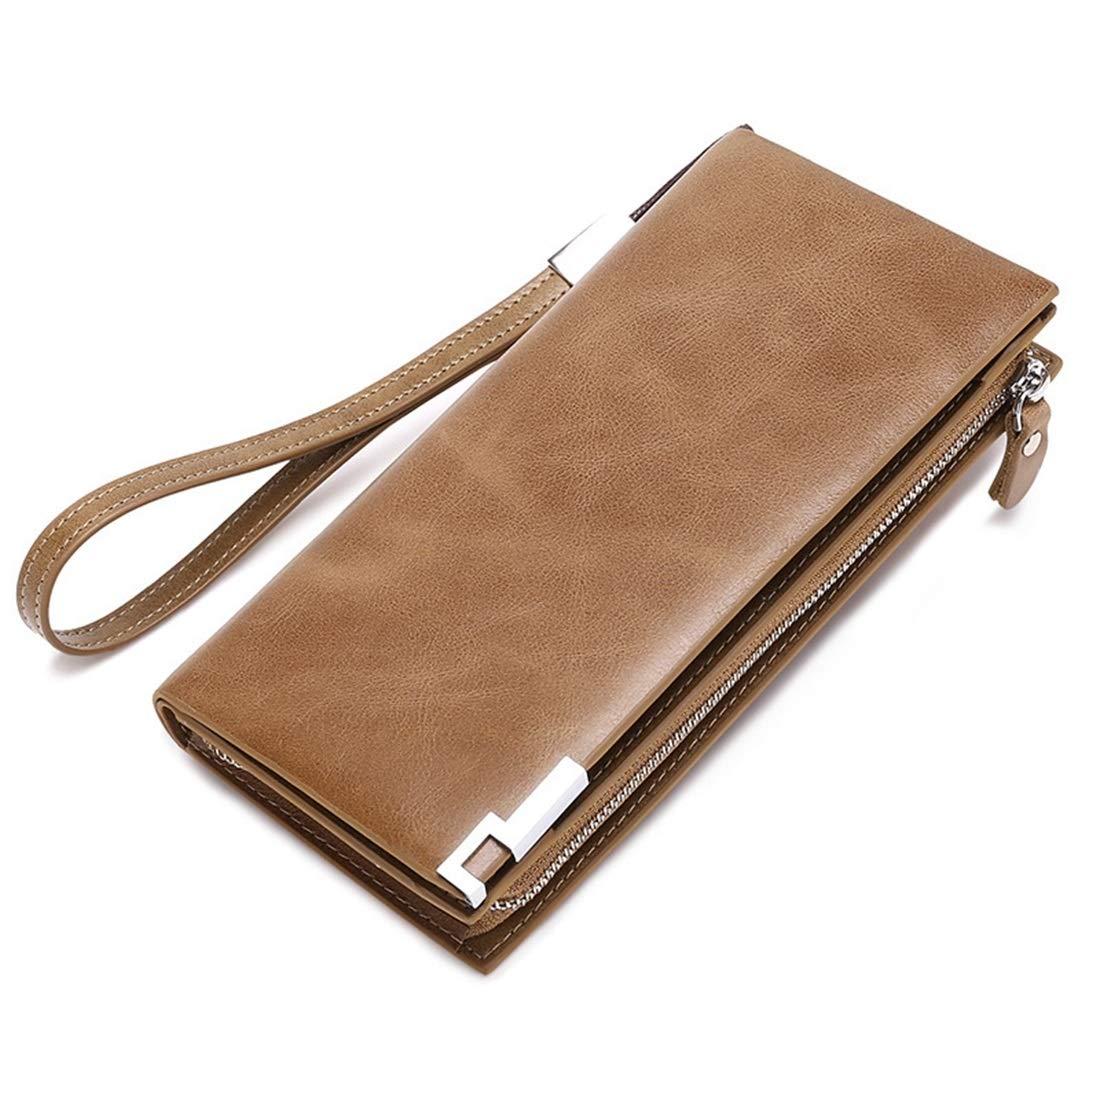 Color : Brown KRPENRIO Leather Mens Purse Long Wallet Youth Cowhide Wallet Zipper Wallet Khaki 2-Fold Wallet